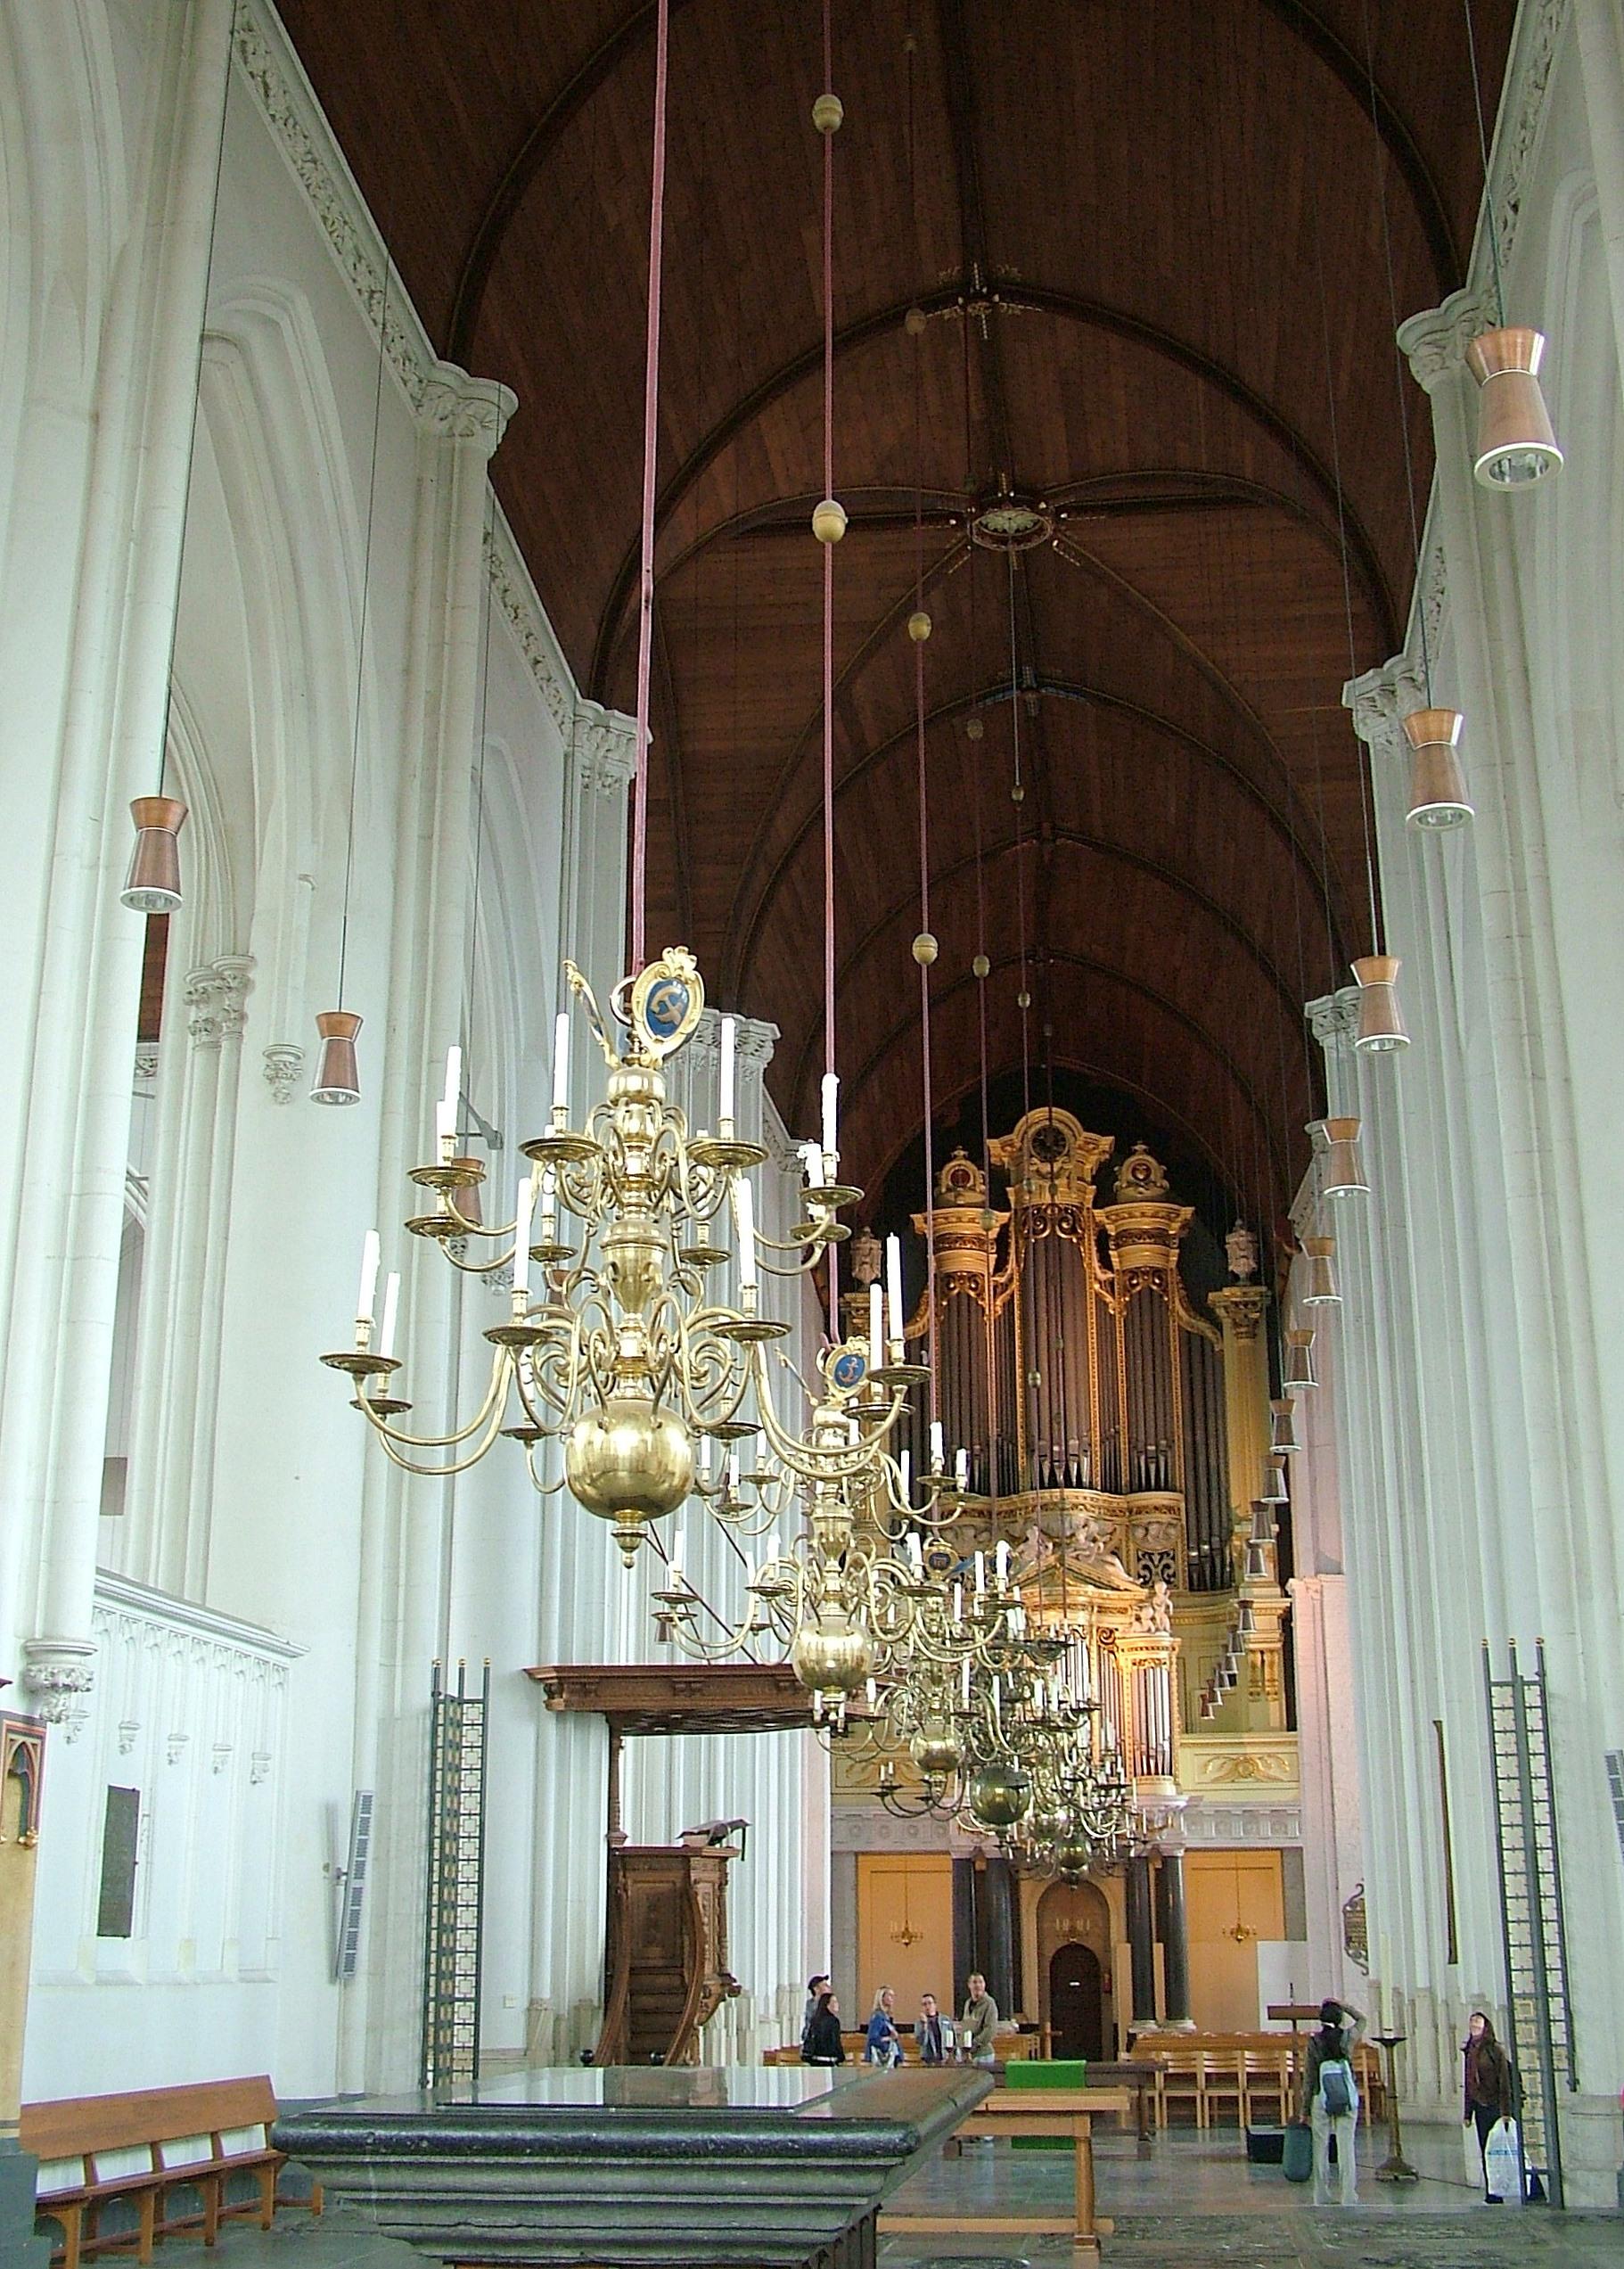 https://upload.wikimedia.org/wikipedia/commons/d/d7/2008-09_Nijmegen_st_stevens_interieur.JPG